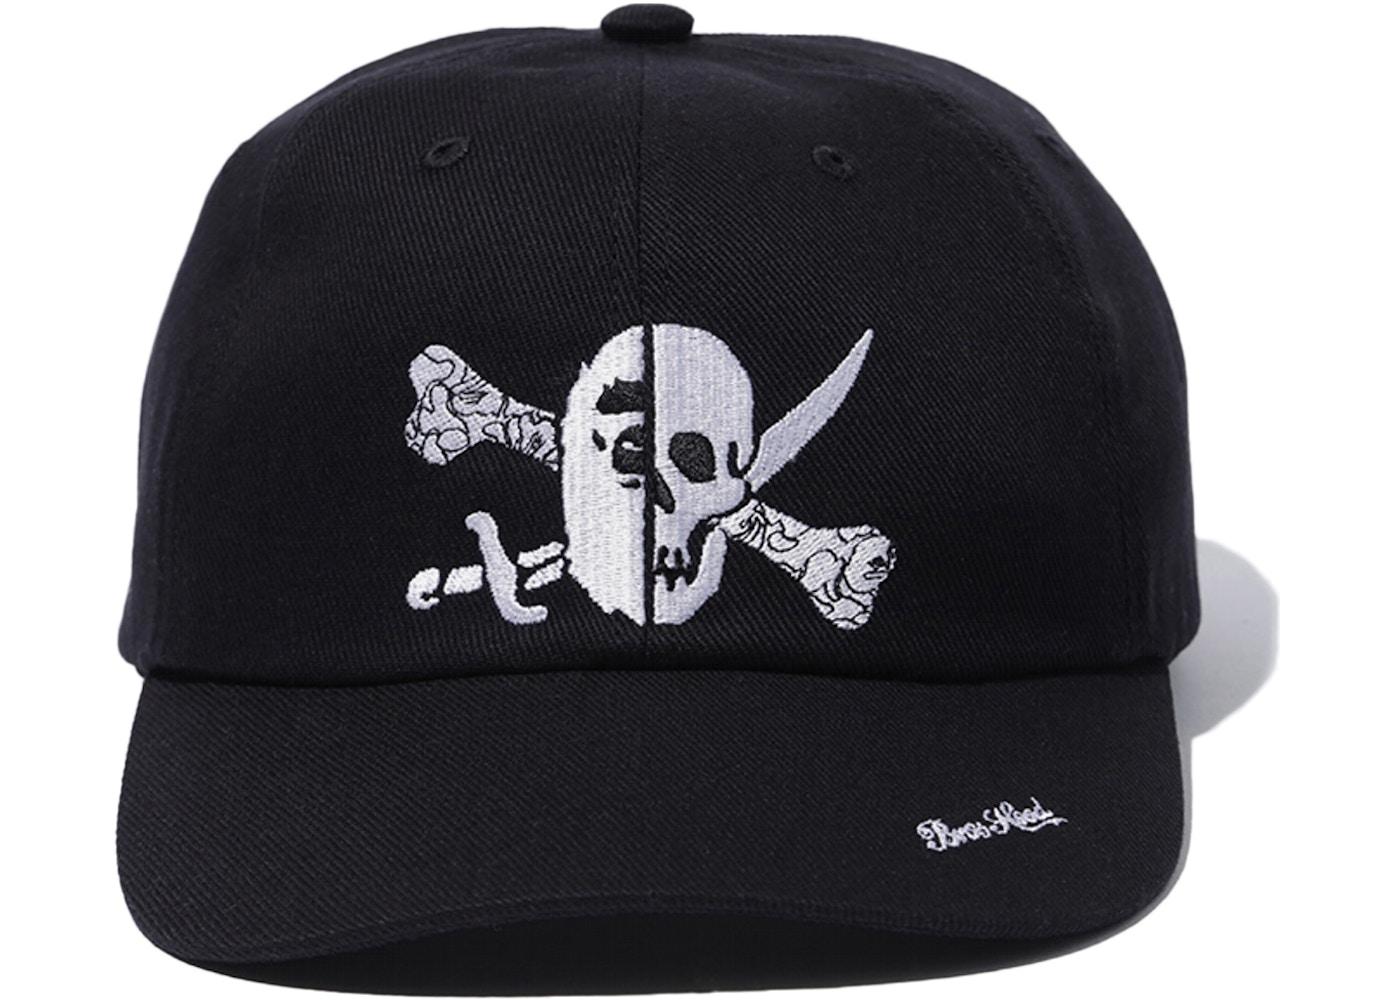 premium selection 31603 6d81d BAPE x Neighborhood Ape & Skull Cap Black